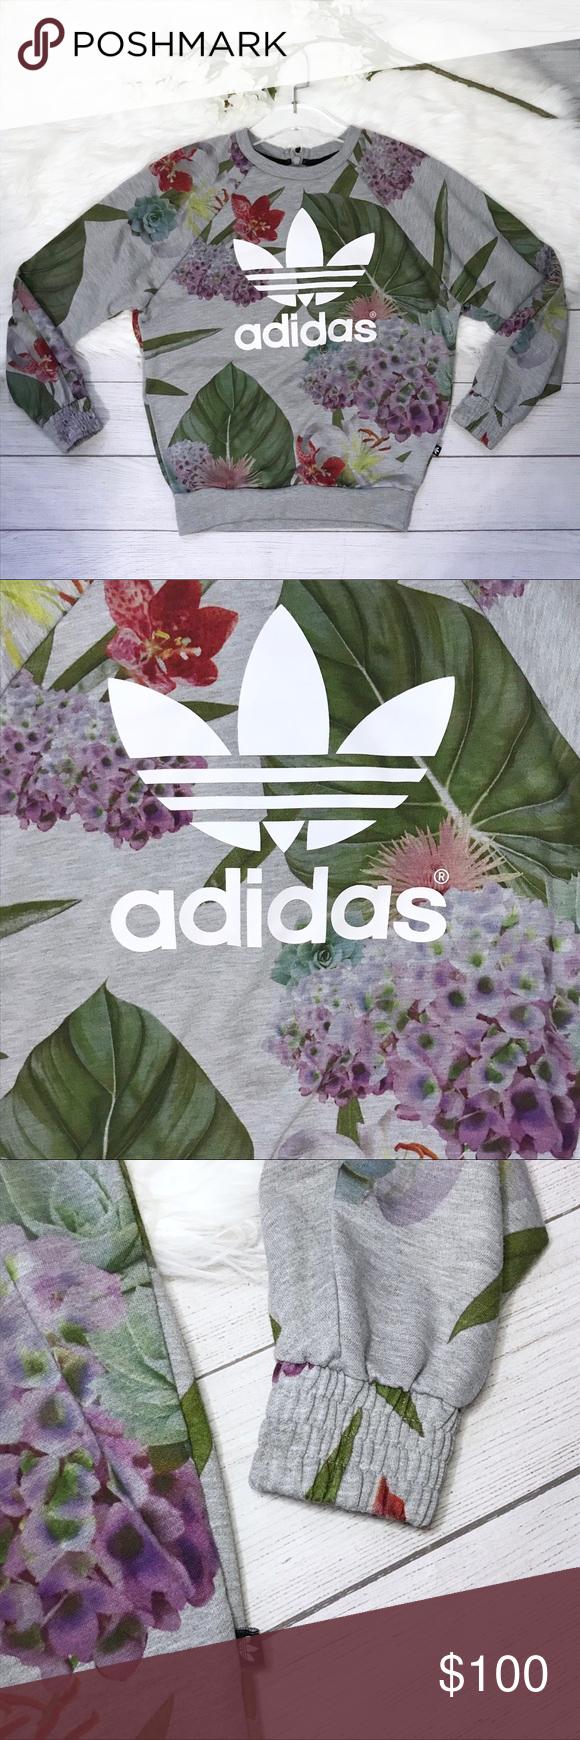 Rare Adidas Train Aop Sweatshirt Succulent Print Succulents Prints Floral Prints Clothes Design [ 1740 x 580 Pixel ]